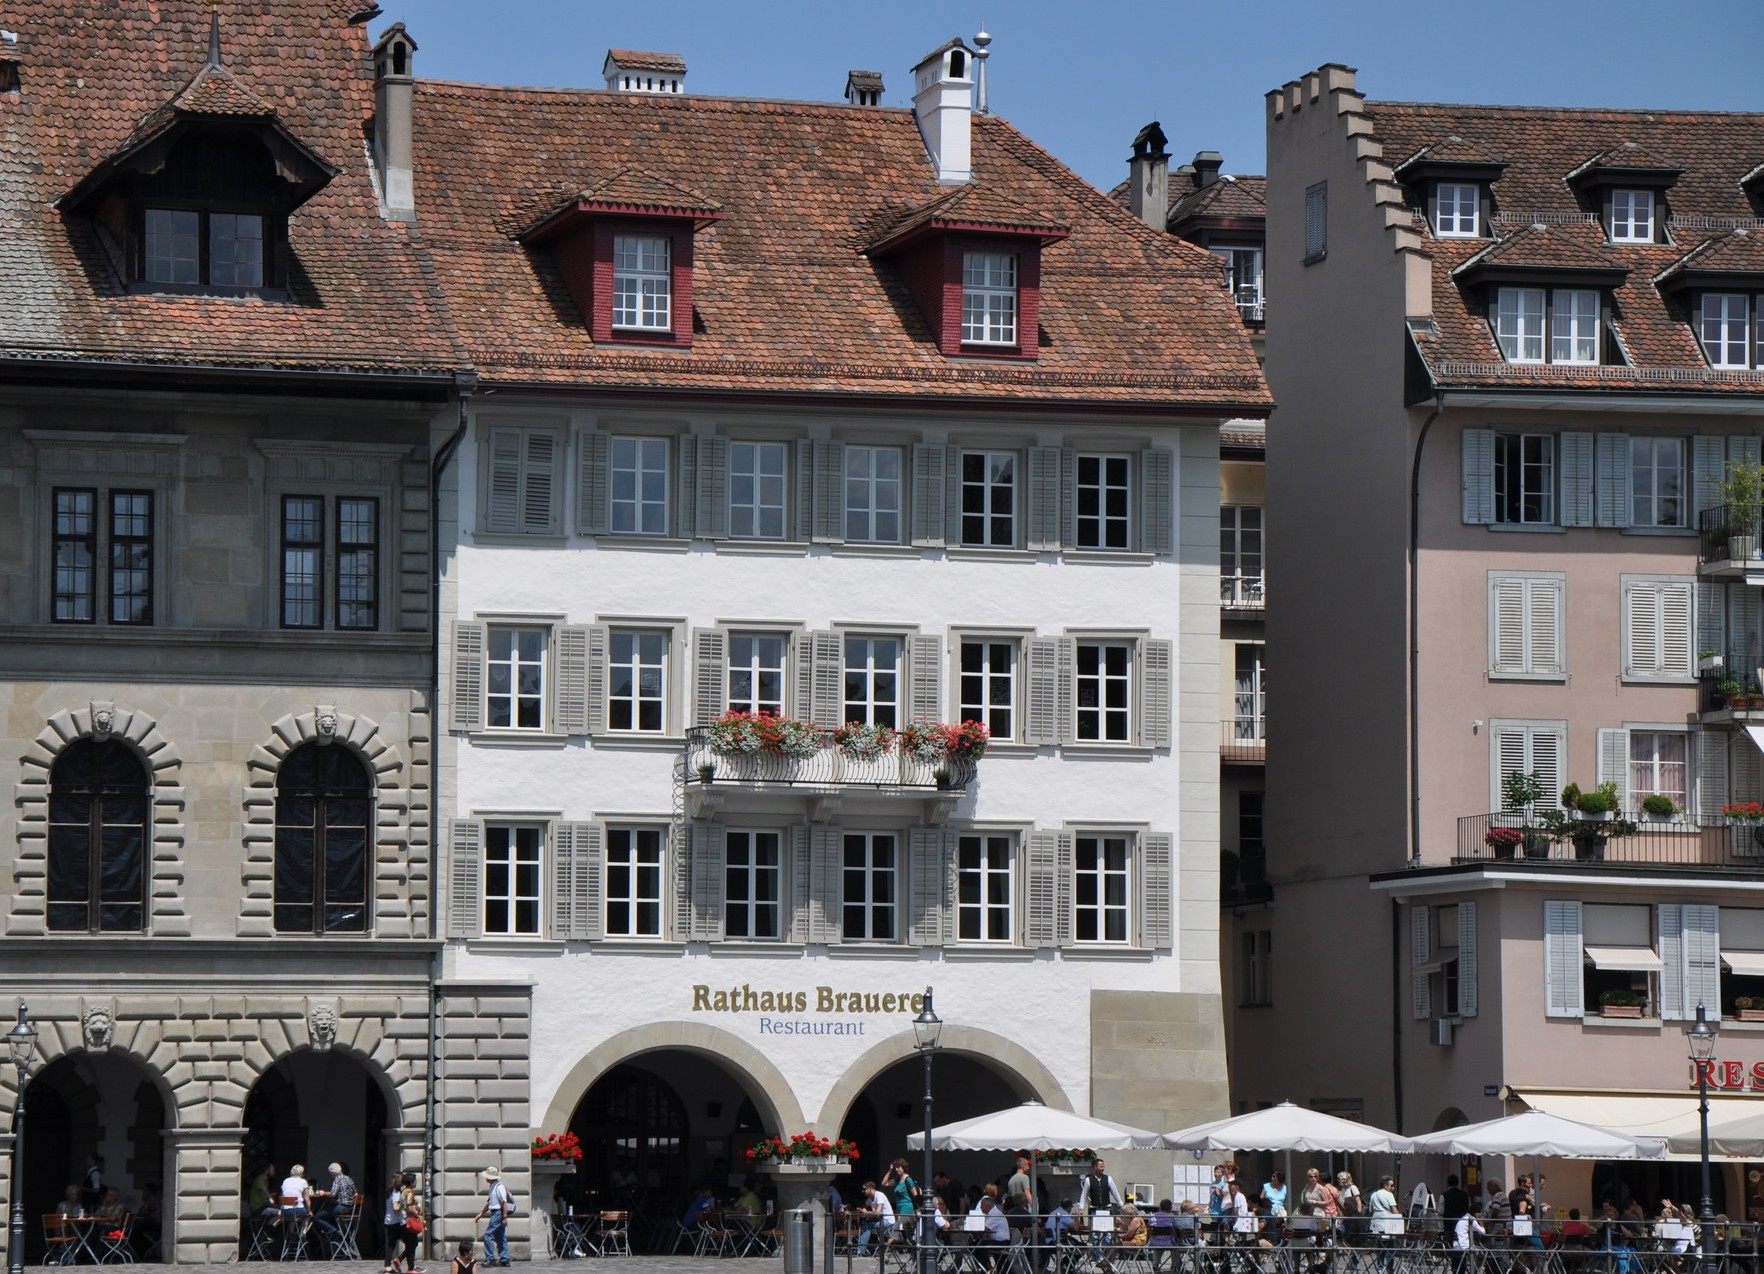 Rathaus Brauerei